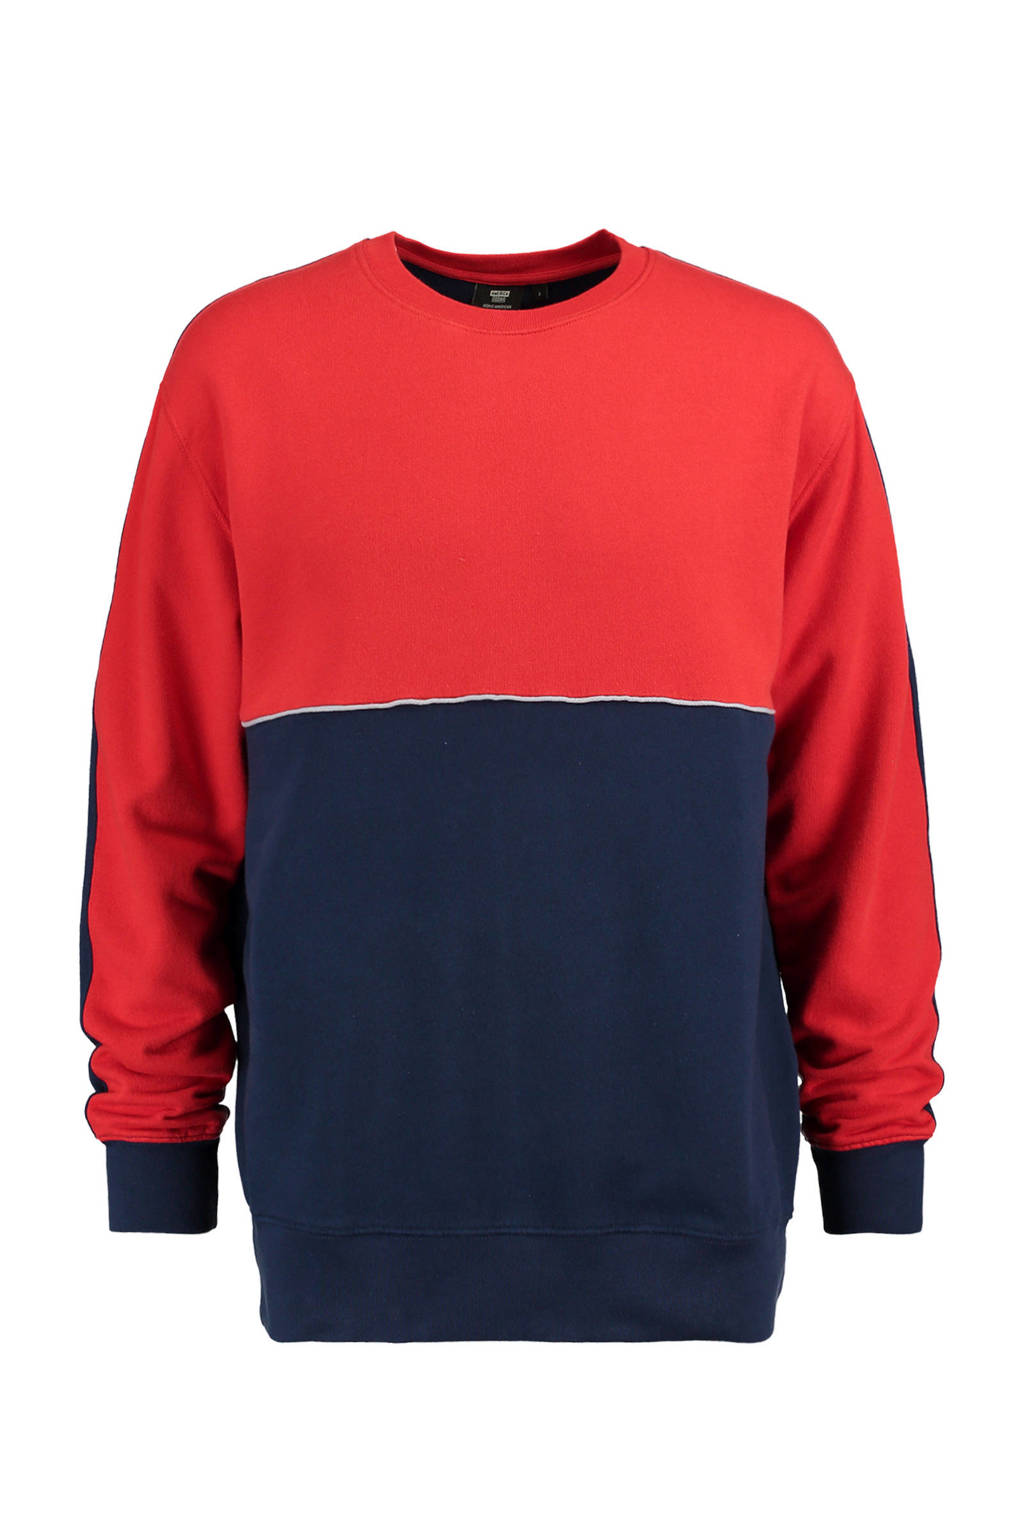 America Today sweater rood, Rood/marine